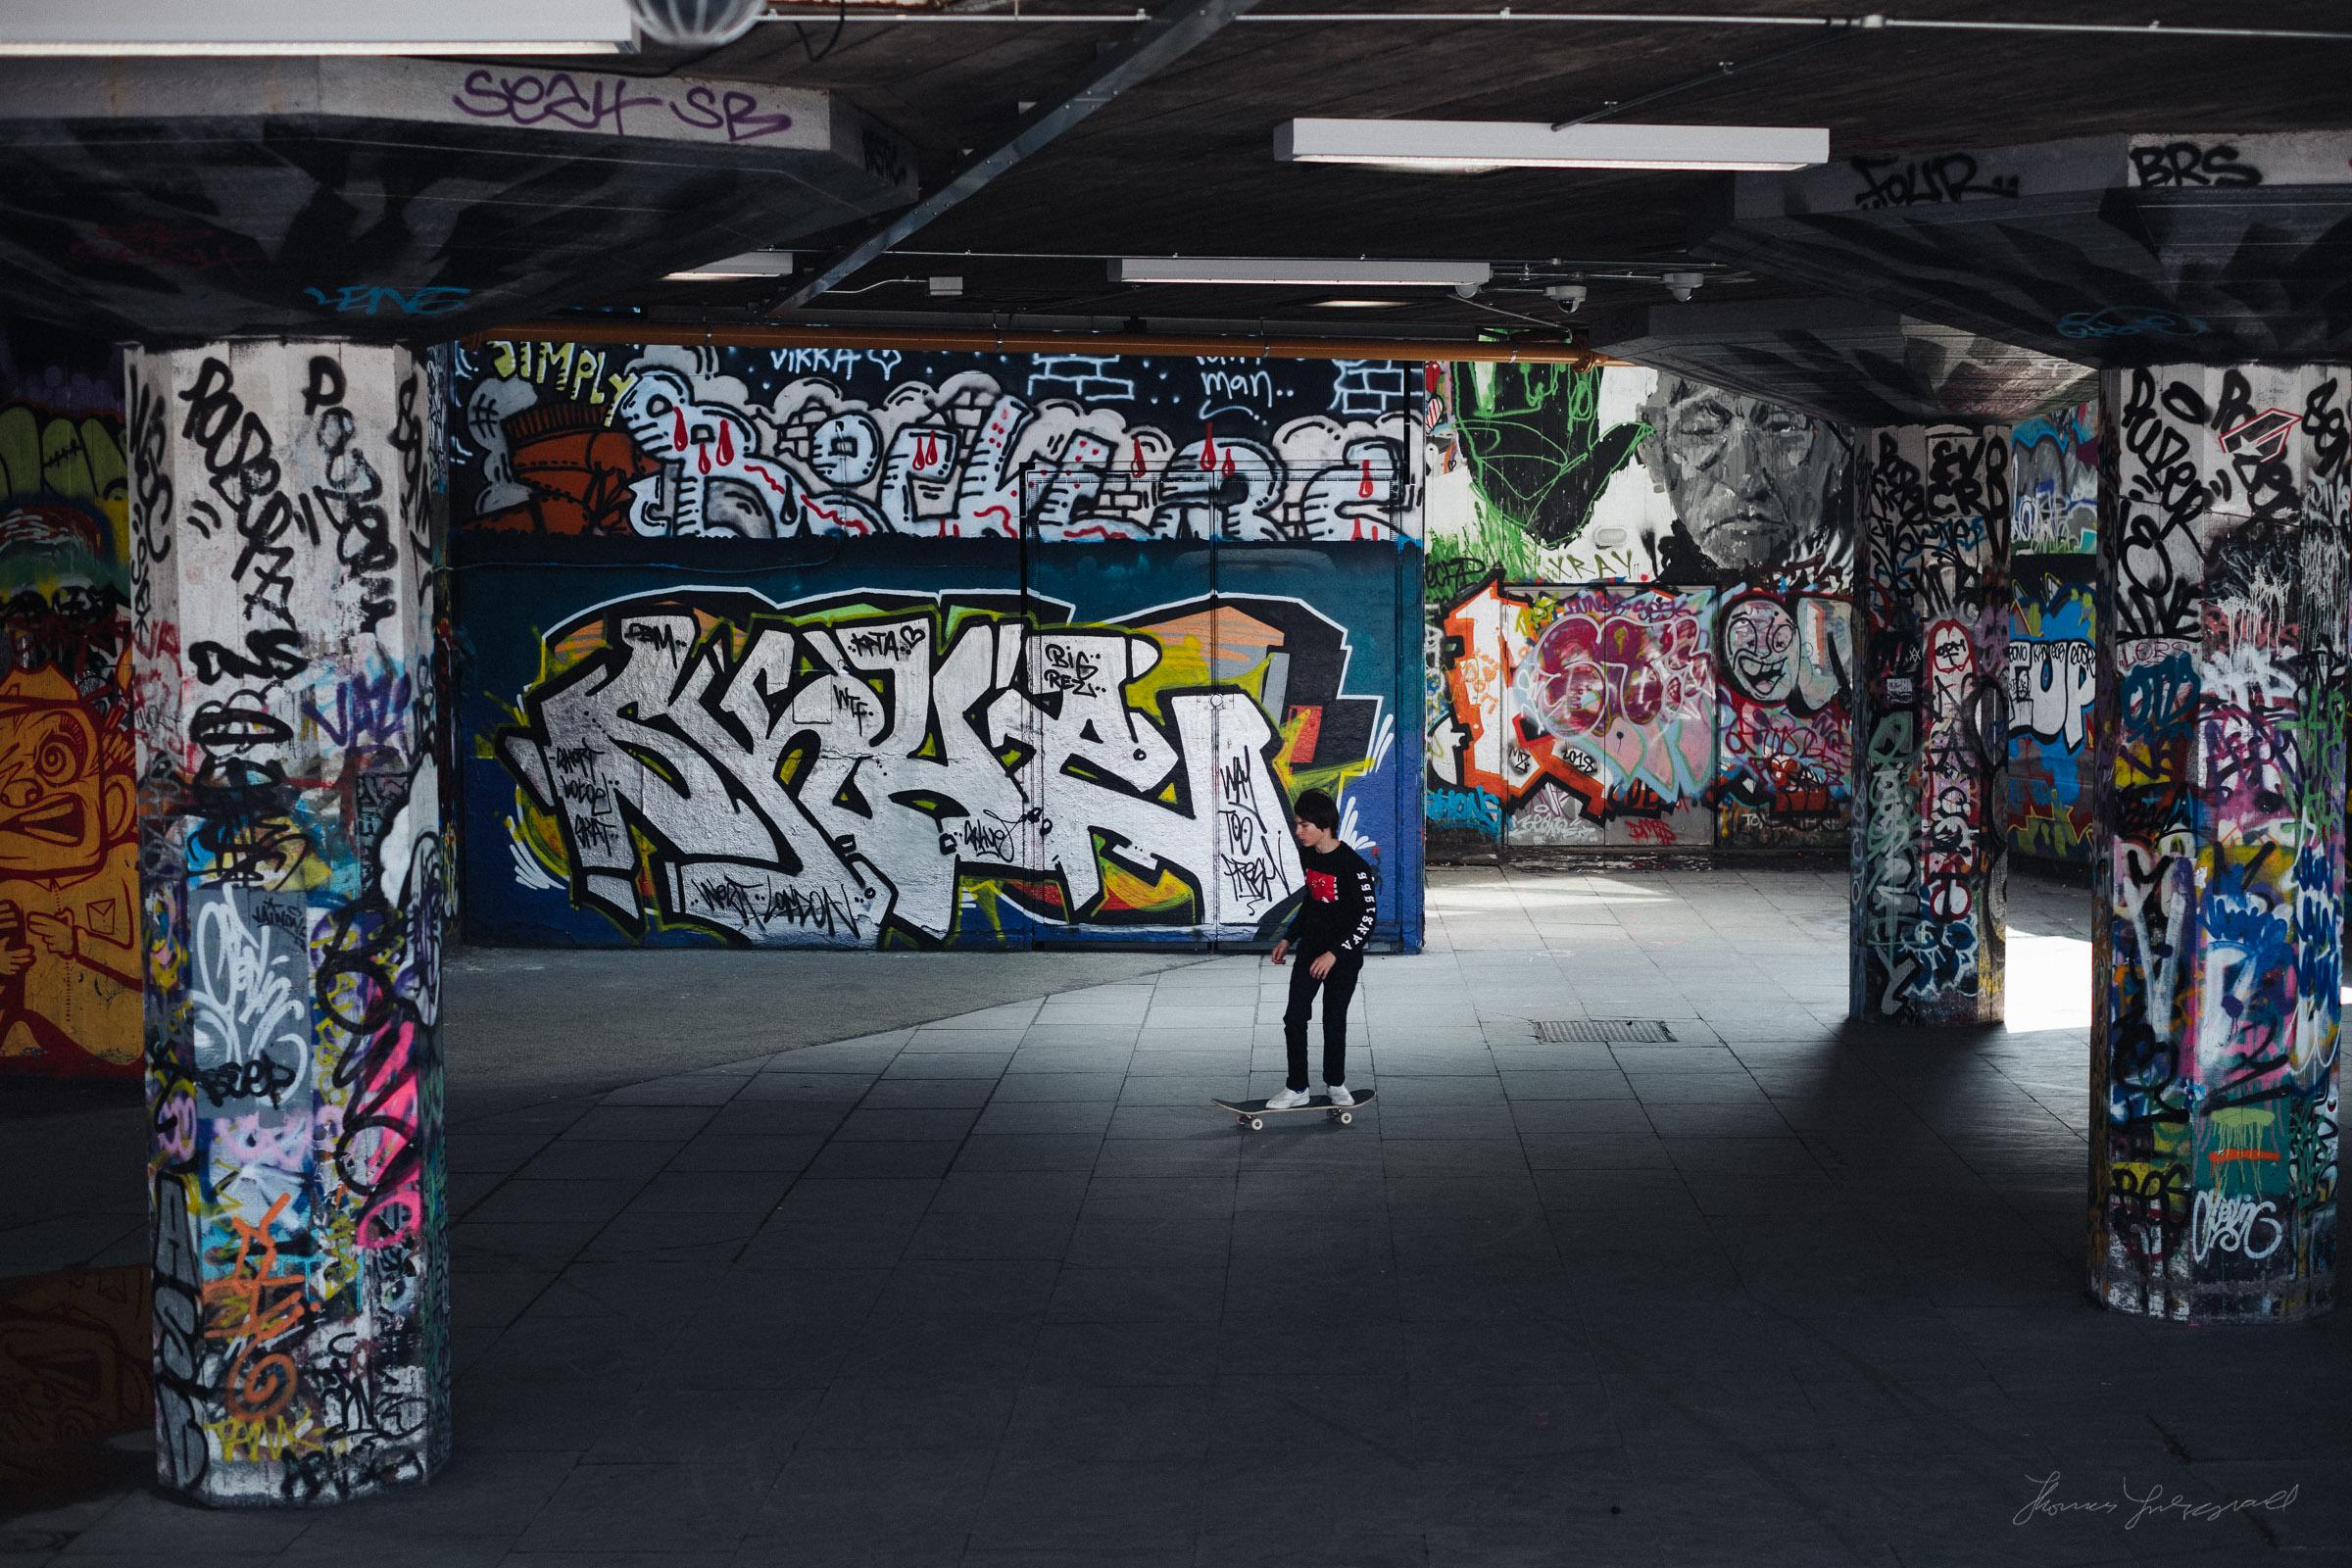 Skateboarding in the Southbank Skateboard park in London